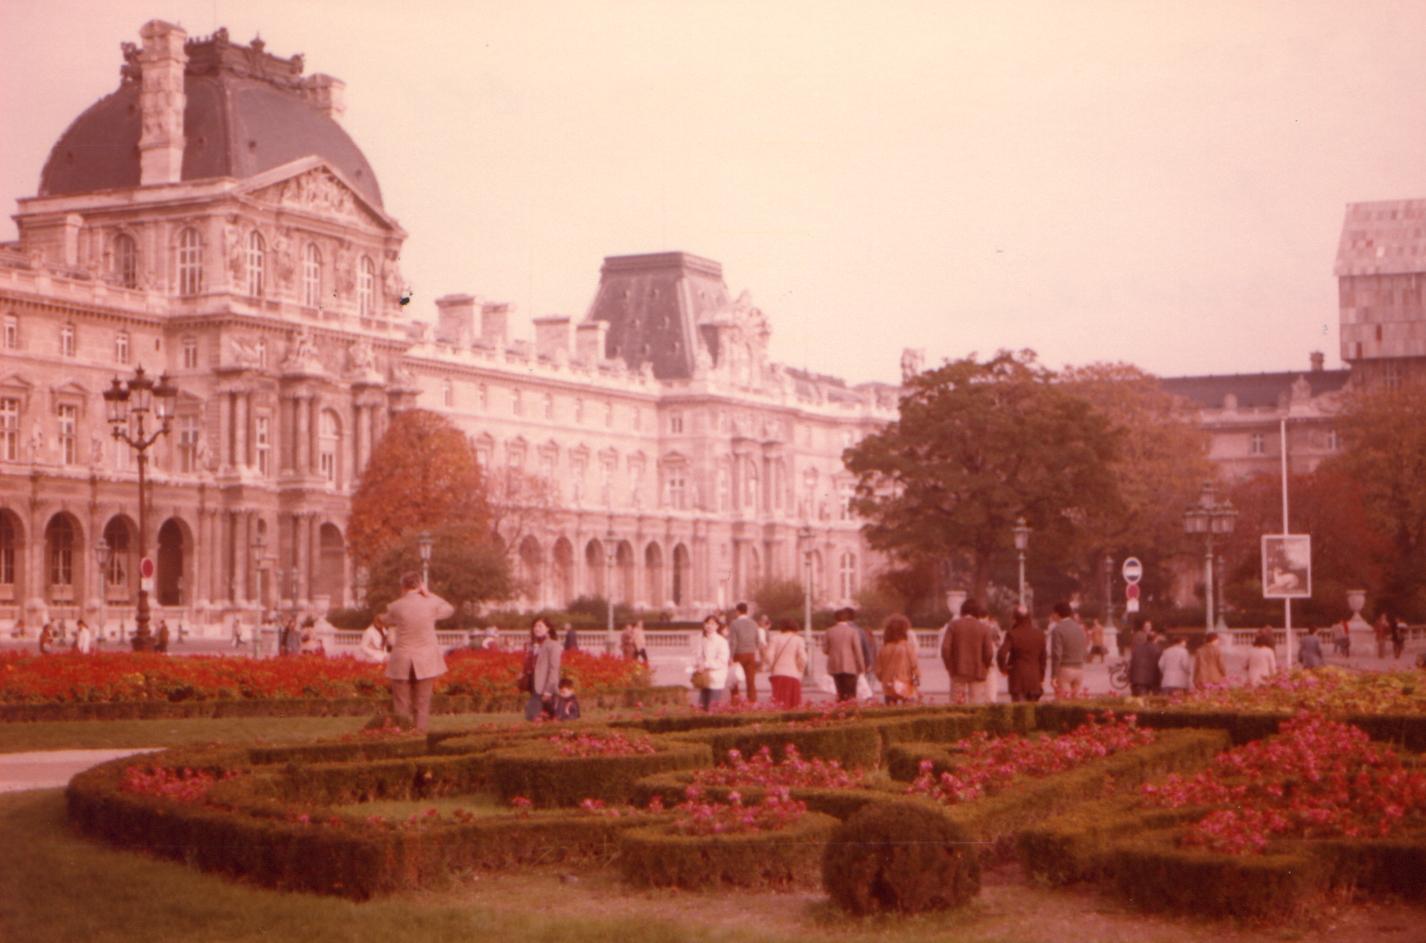 1982 08 12 010 Tam, Huong, Dang & Phuong tham Ba Ma 1982 (292)